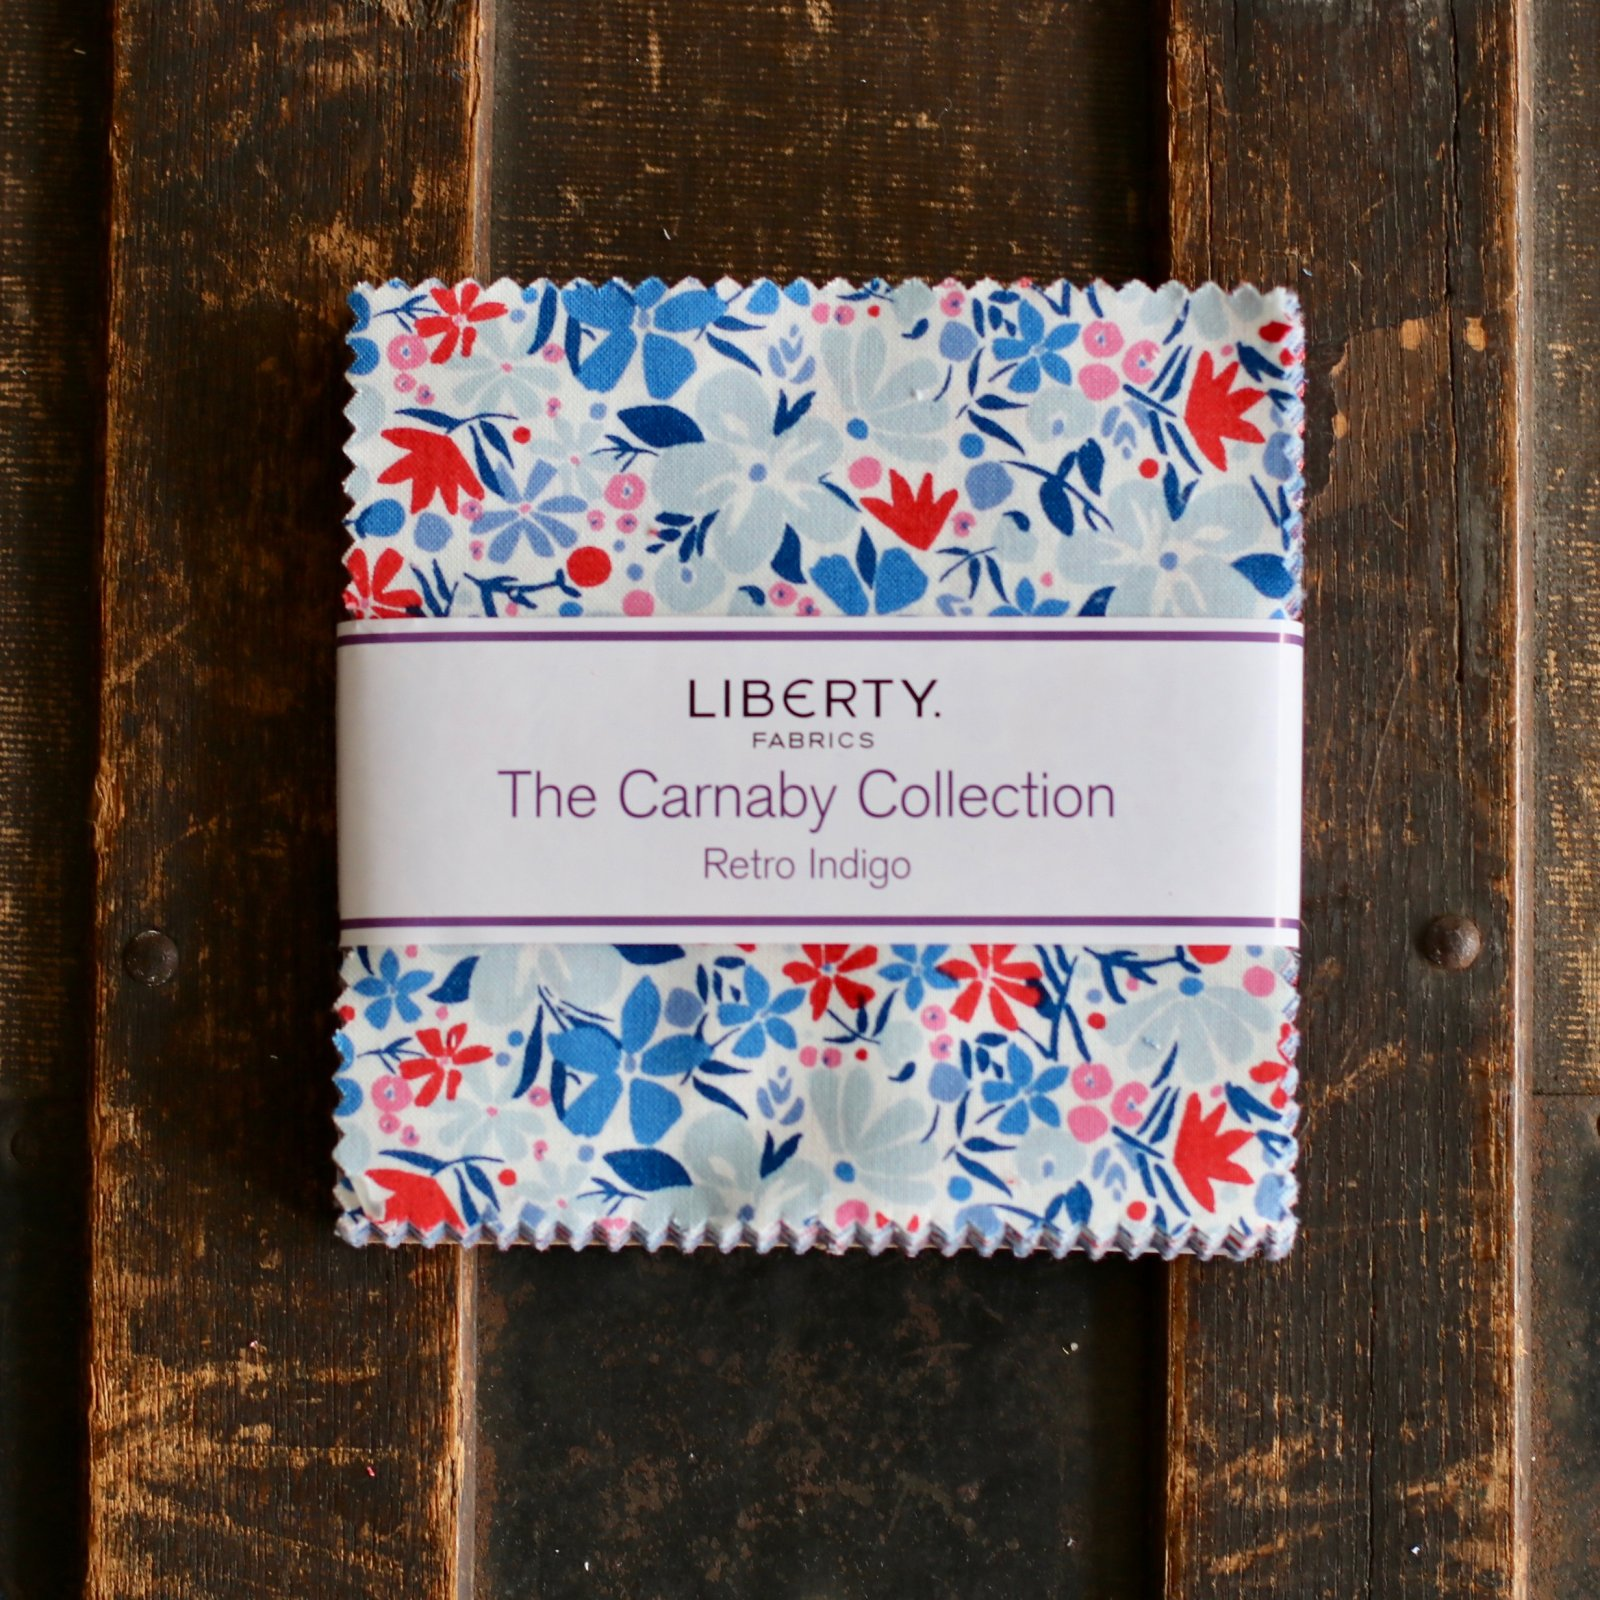 Liberty Fabrics The Carnaby Collection - Retro Indigo 5 Stacker